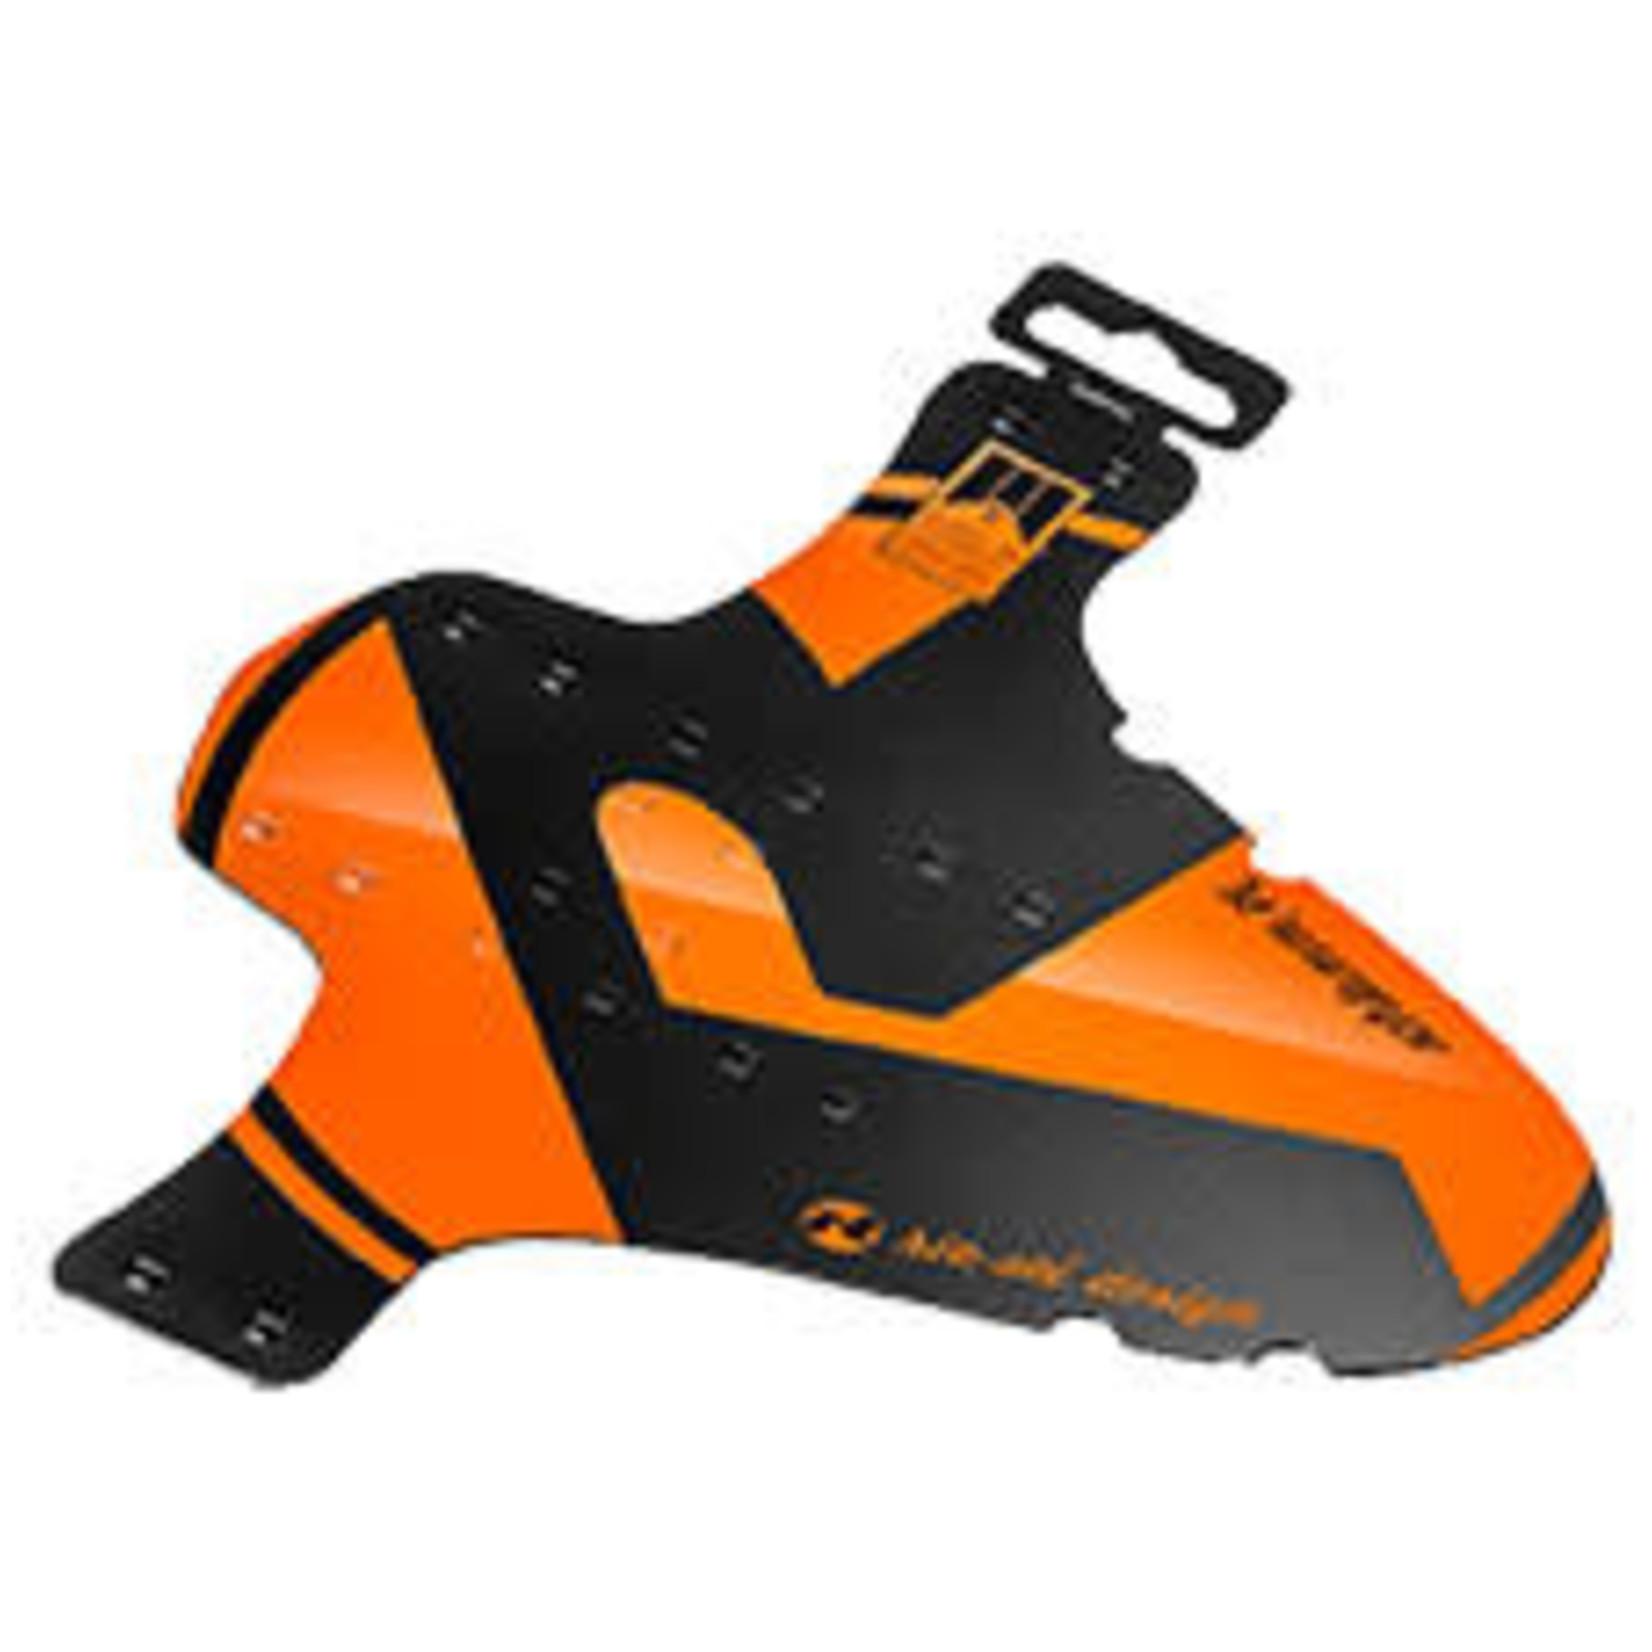 Rie Sel Design Schutzbleche Vorne a Fascette Mudguard orange